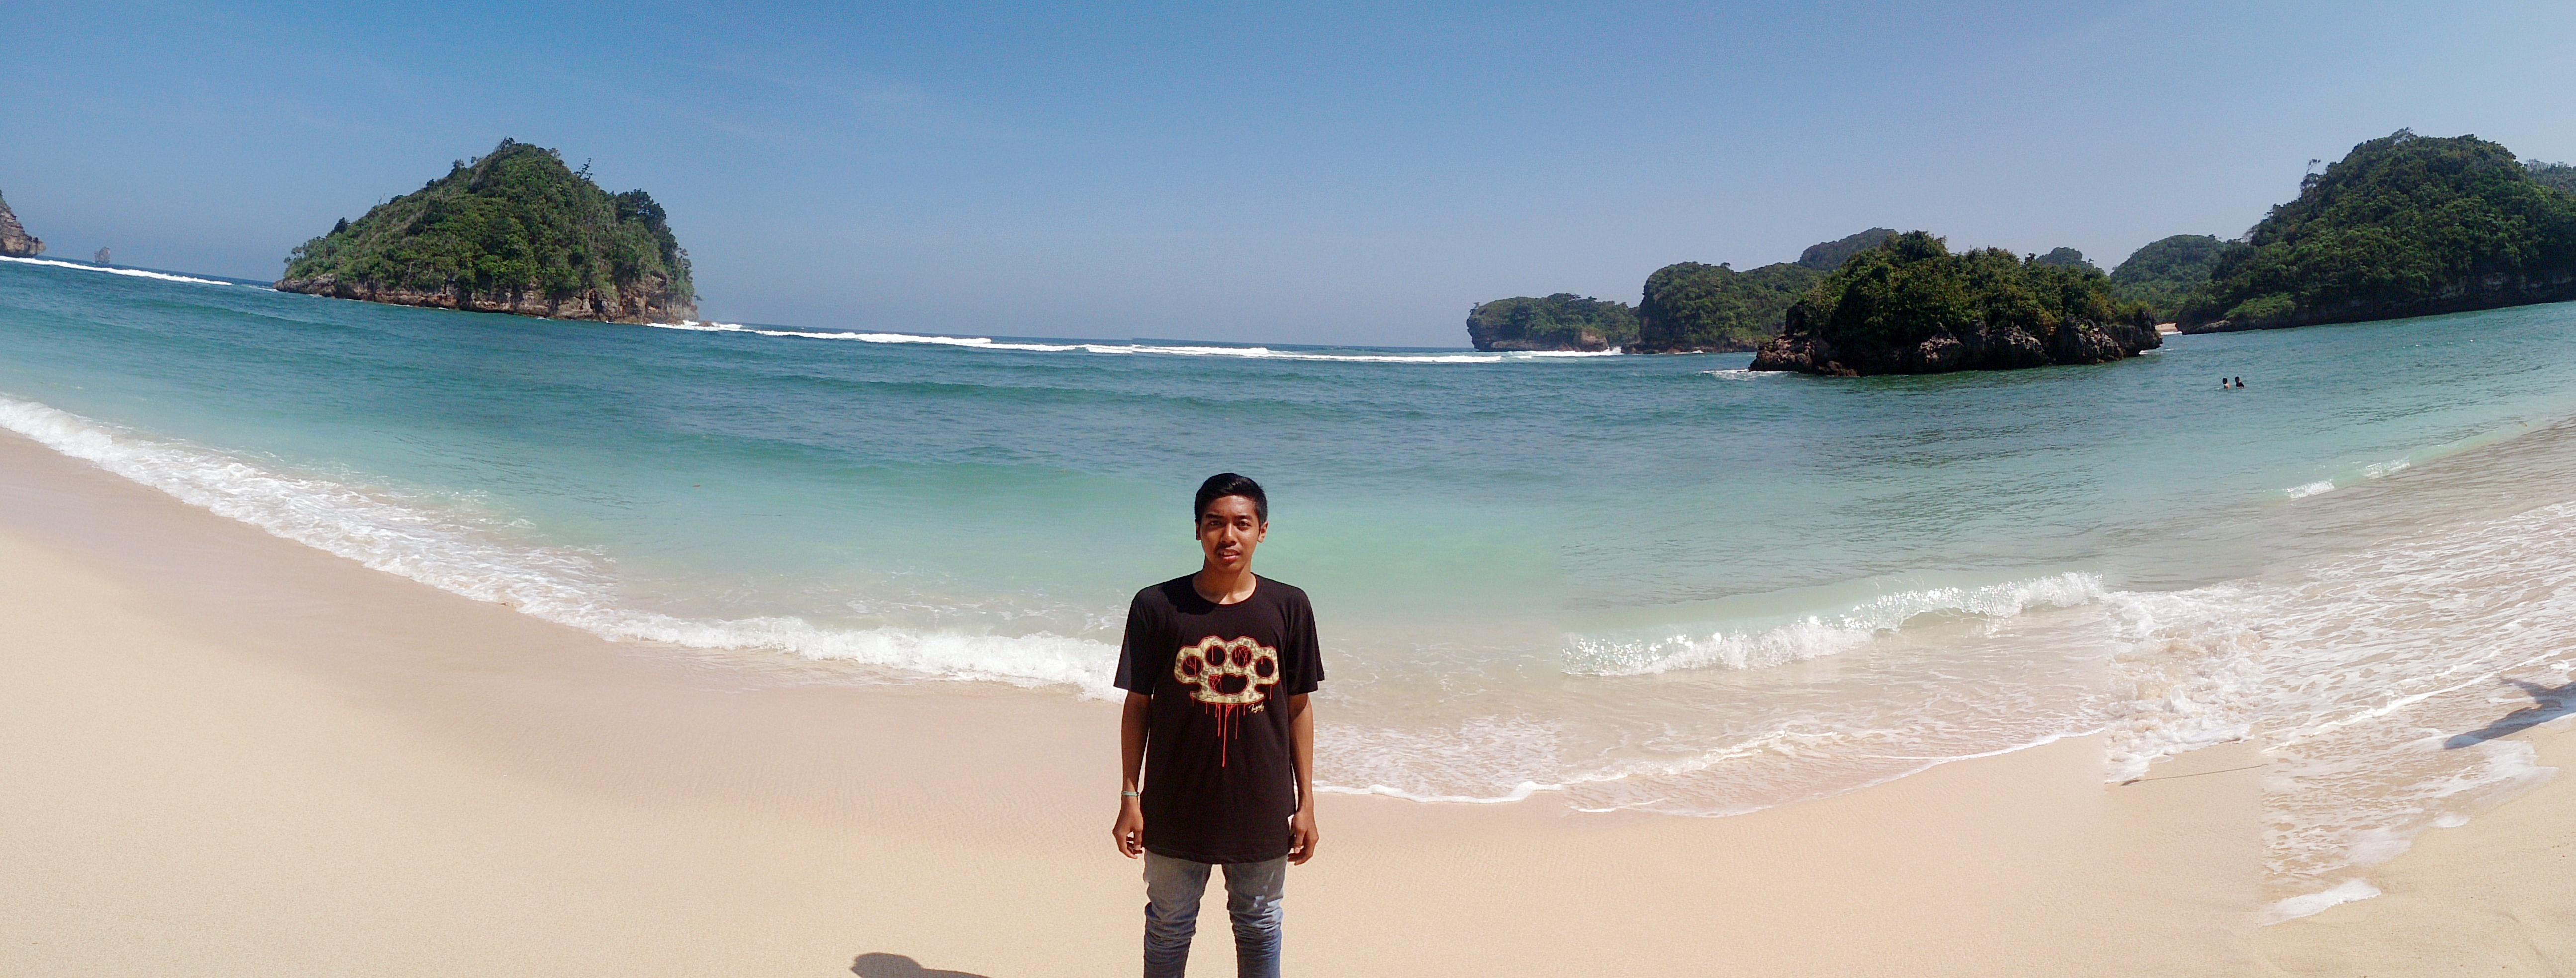 4 Wisata Pantai Kota Malang Rifki Ainul Riza Gatra Clungup